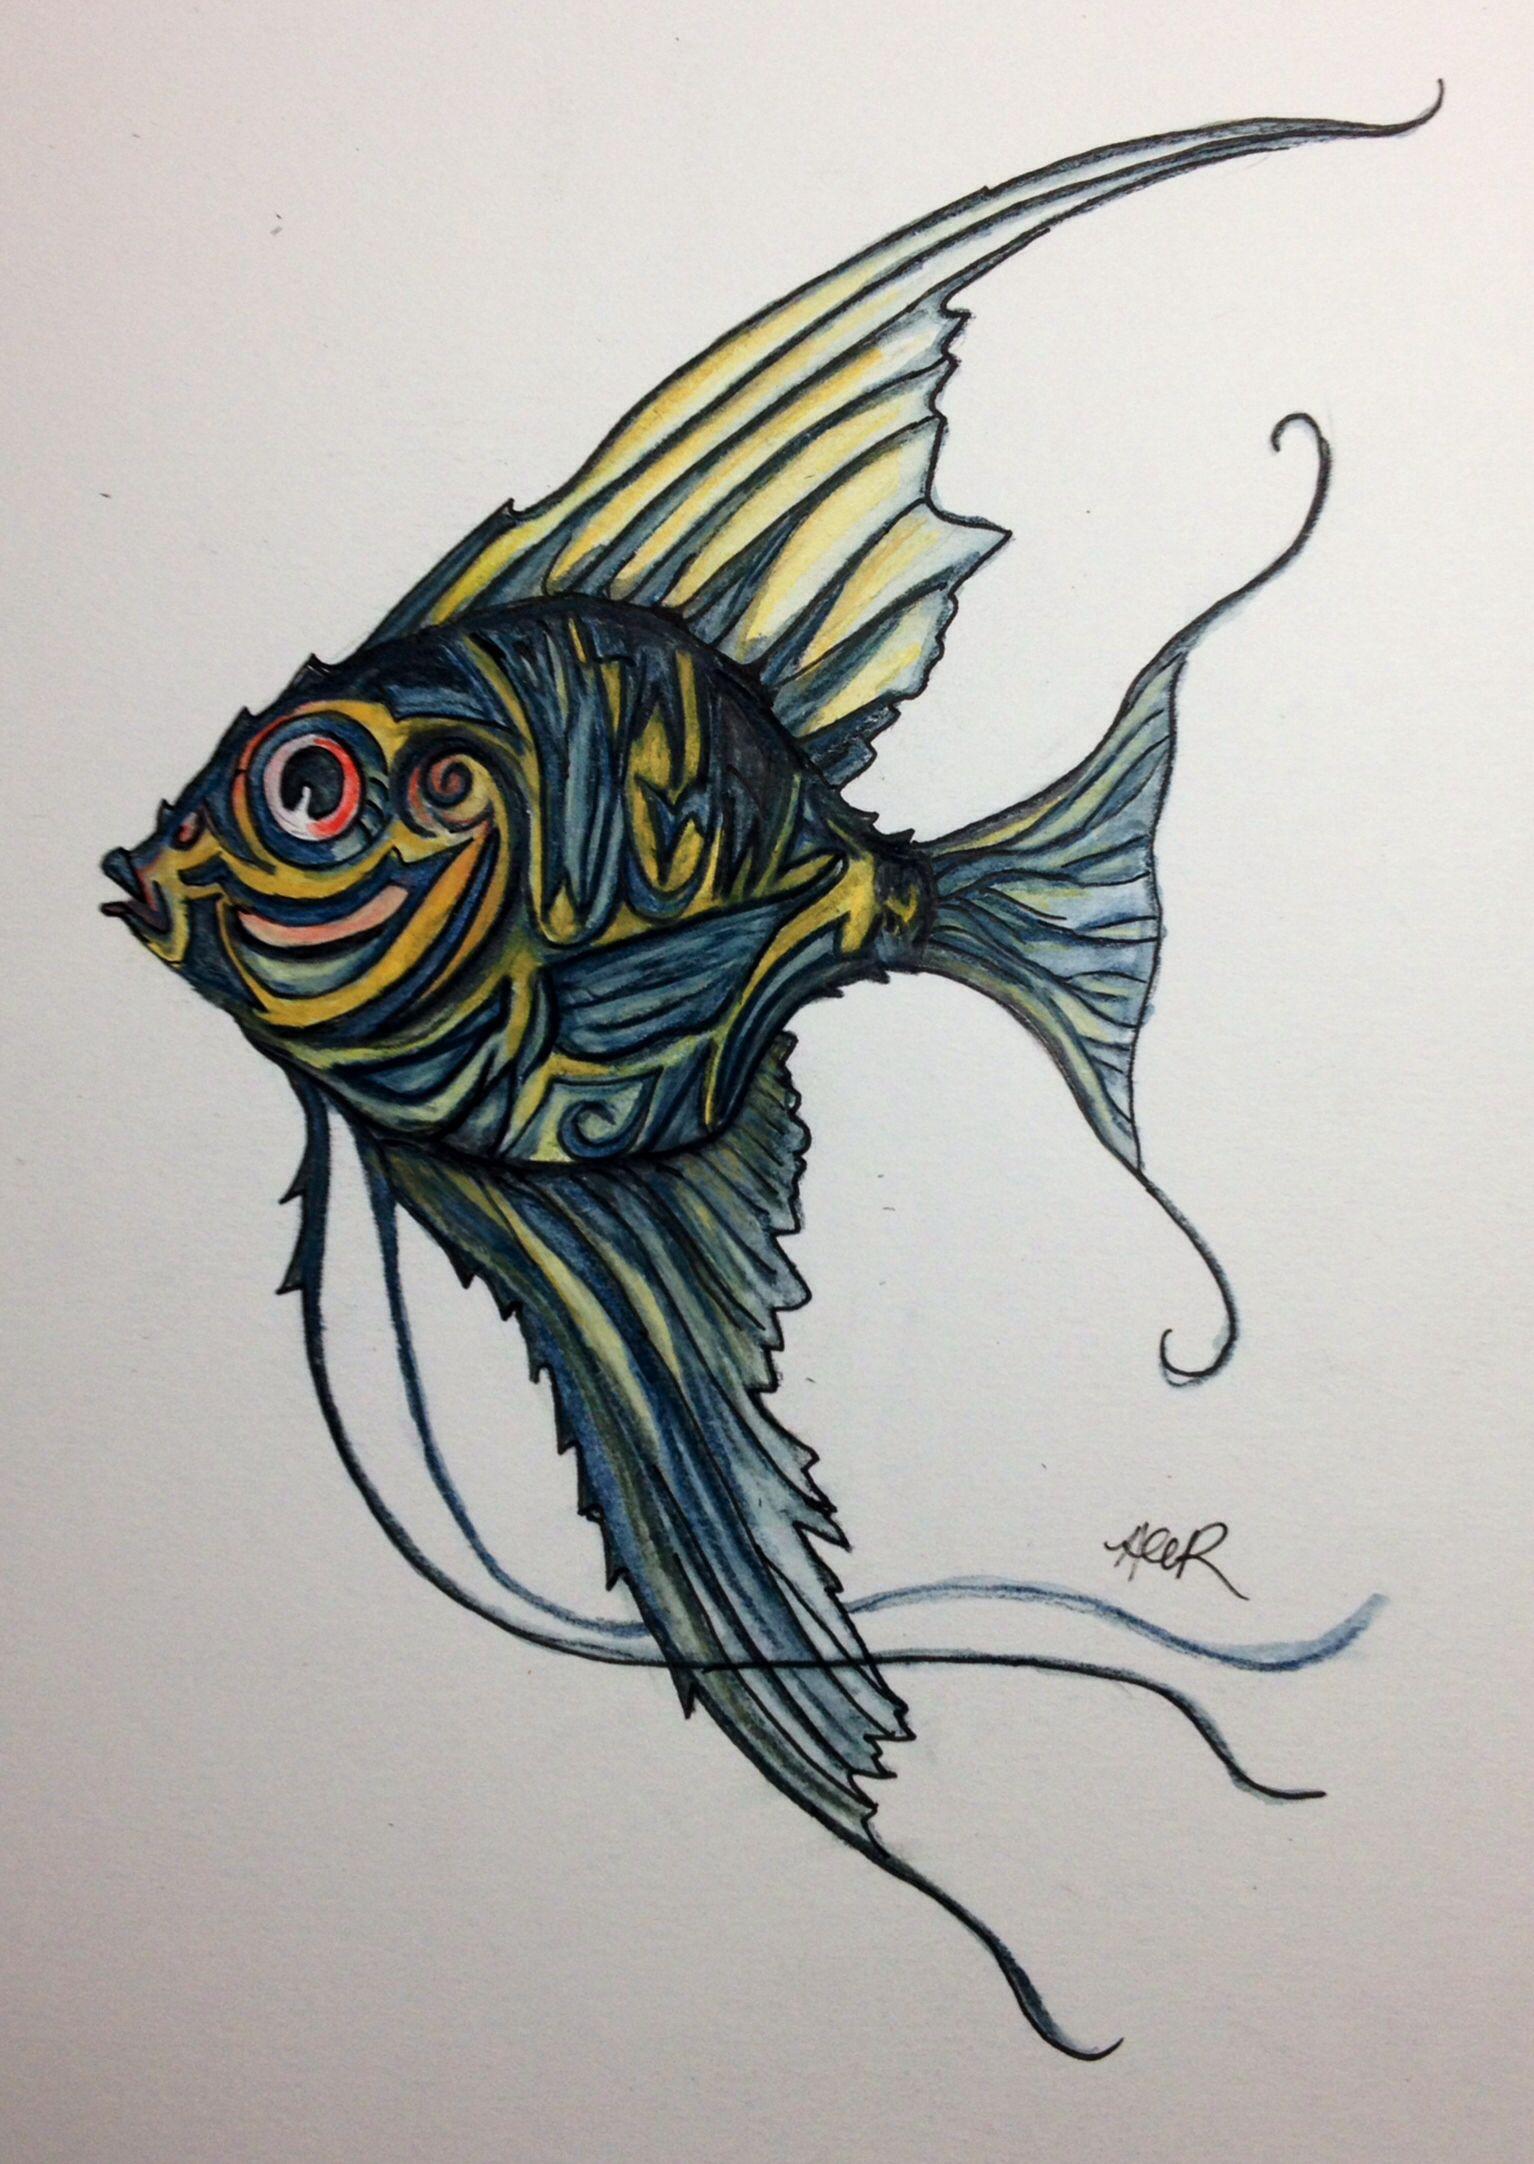 angelfish tattoo design my artwork pinterest angelfish tattoo rh pinterest com Caribbean Blue Angelfish Caribbean Blue Angelfish